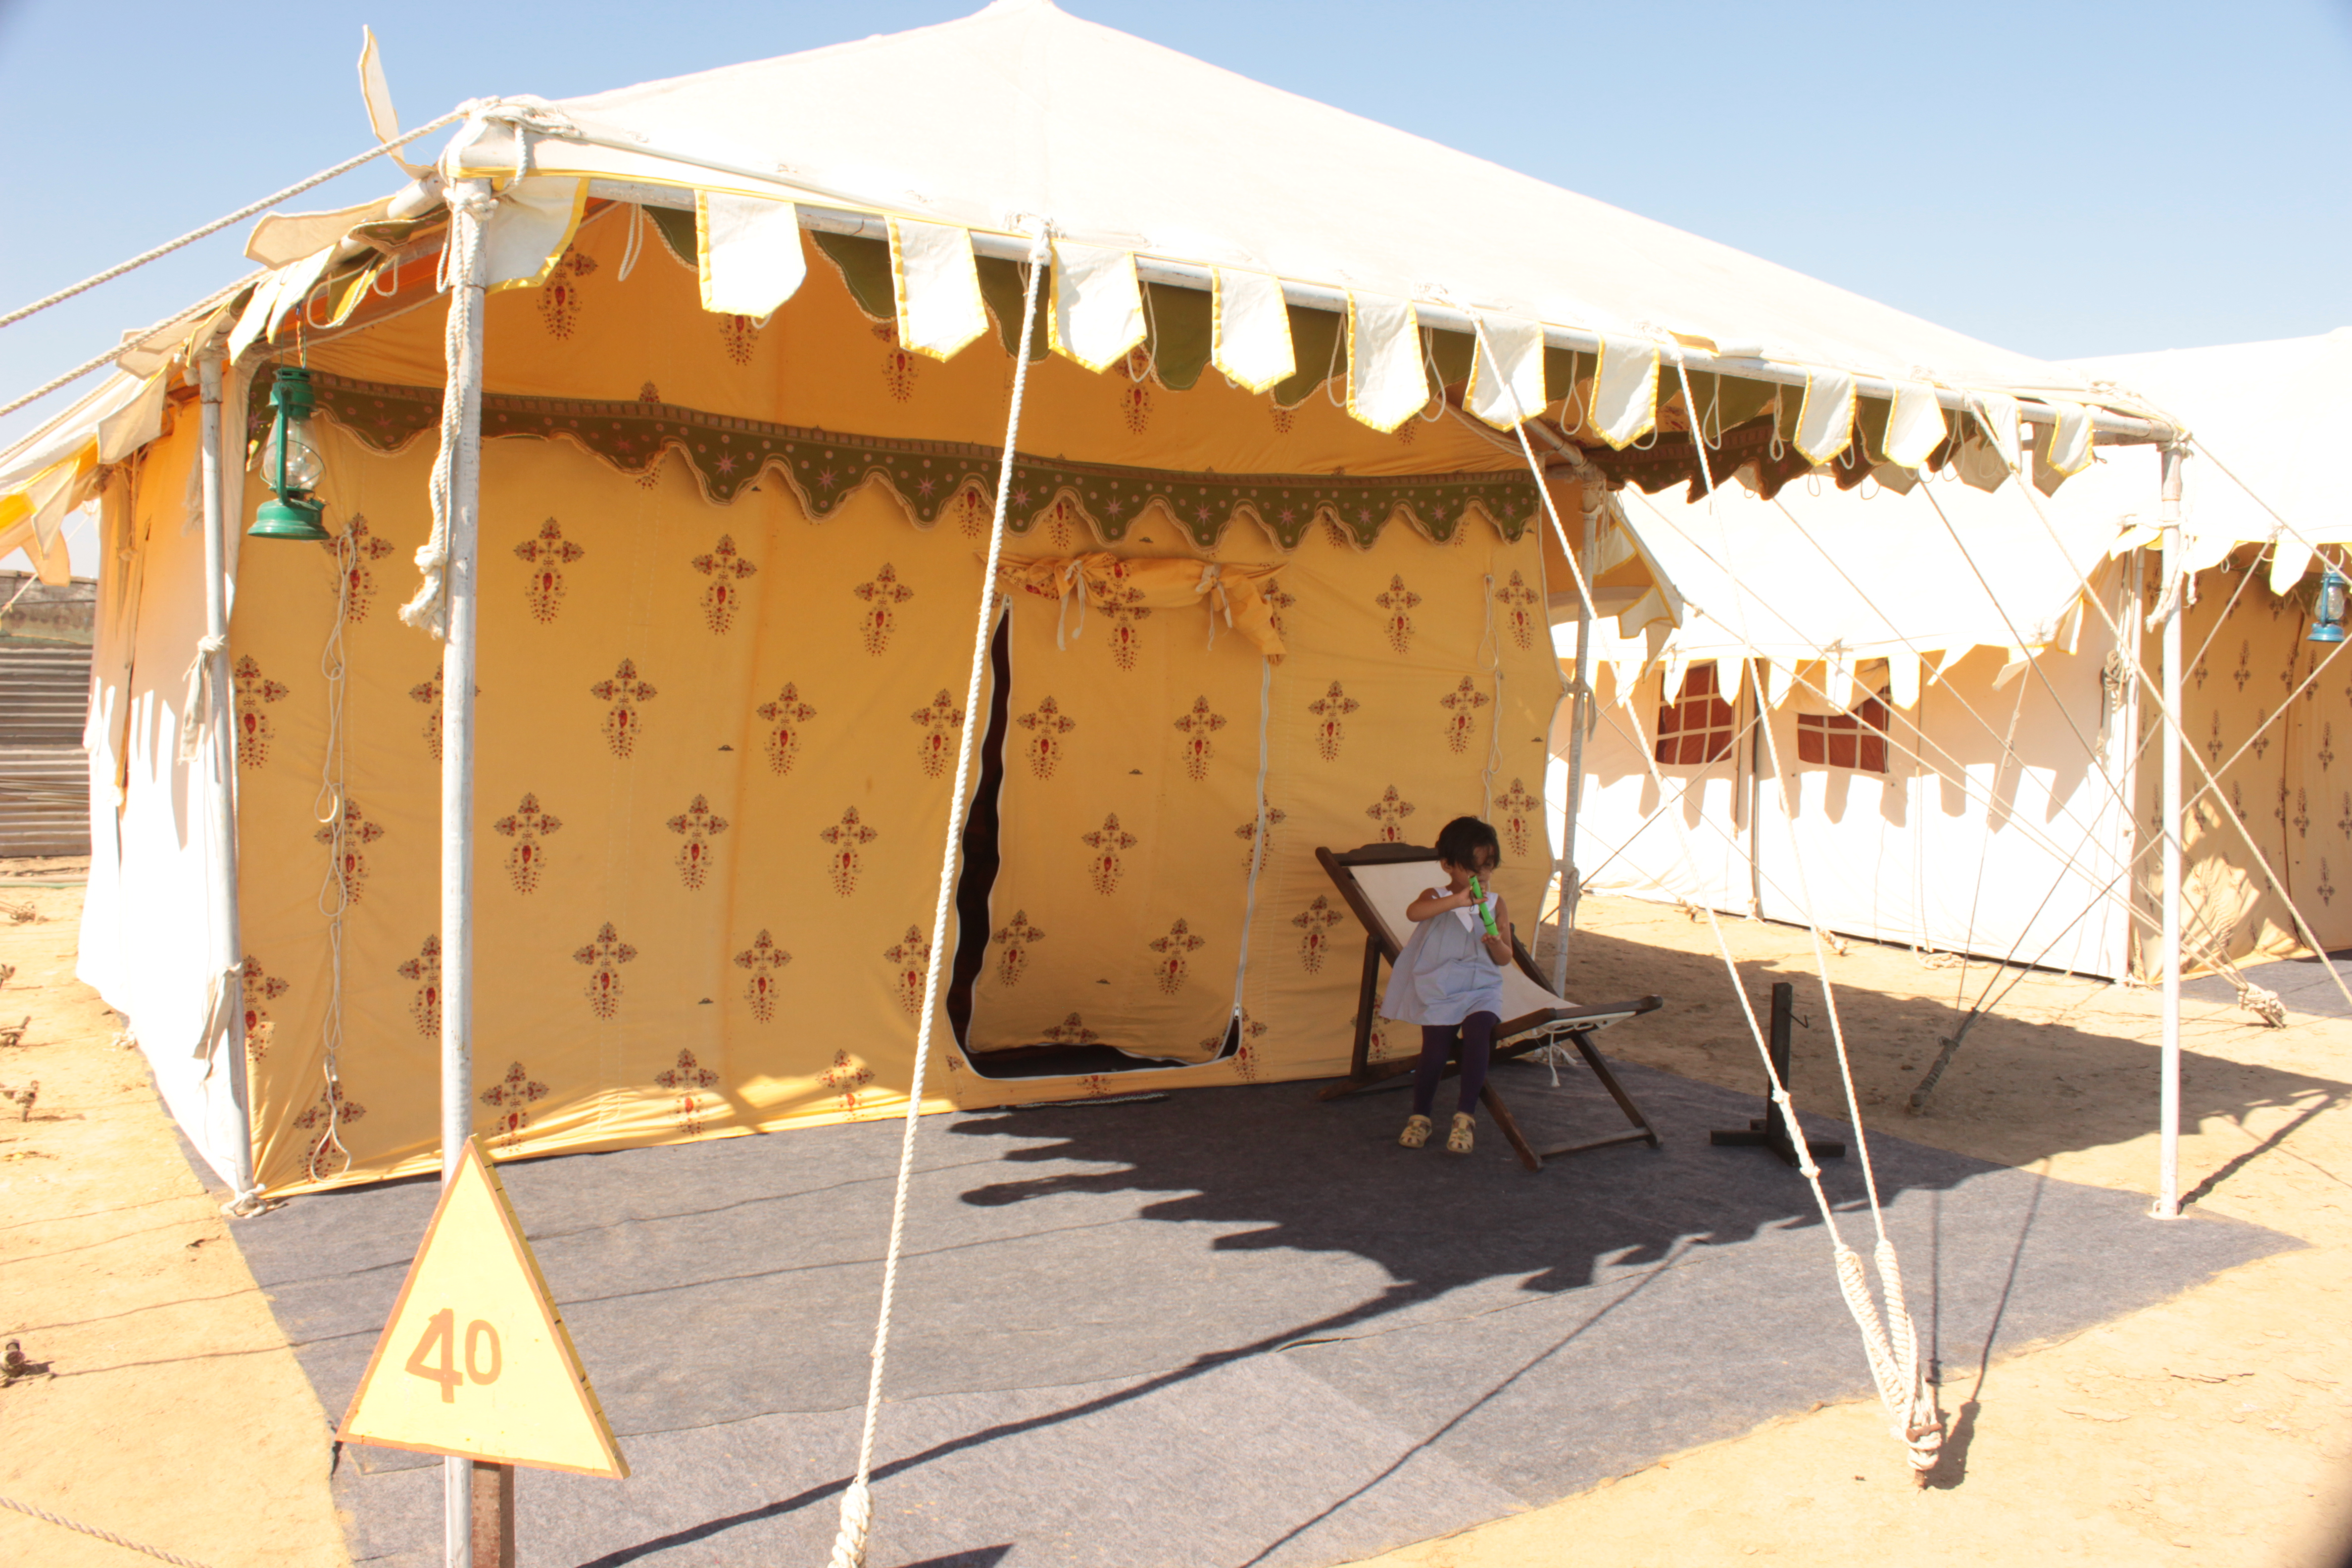 Exploring the tent